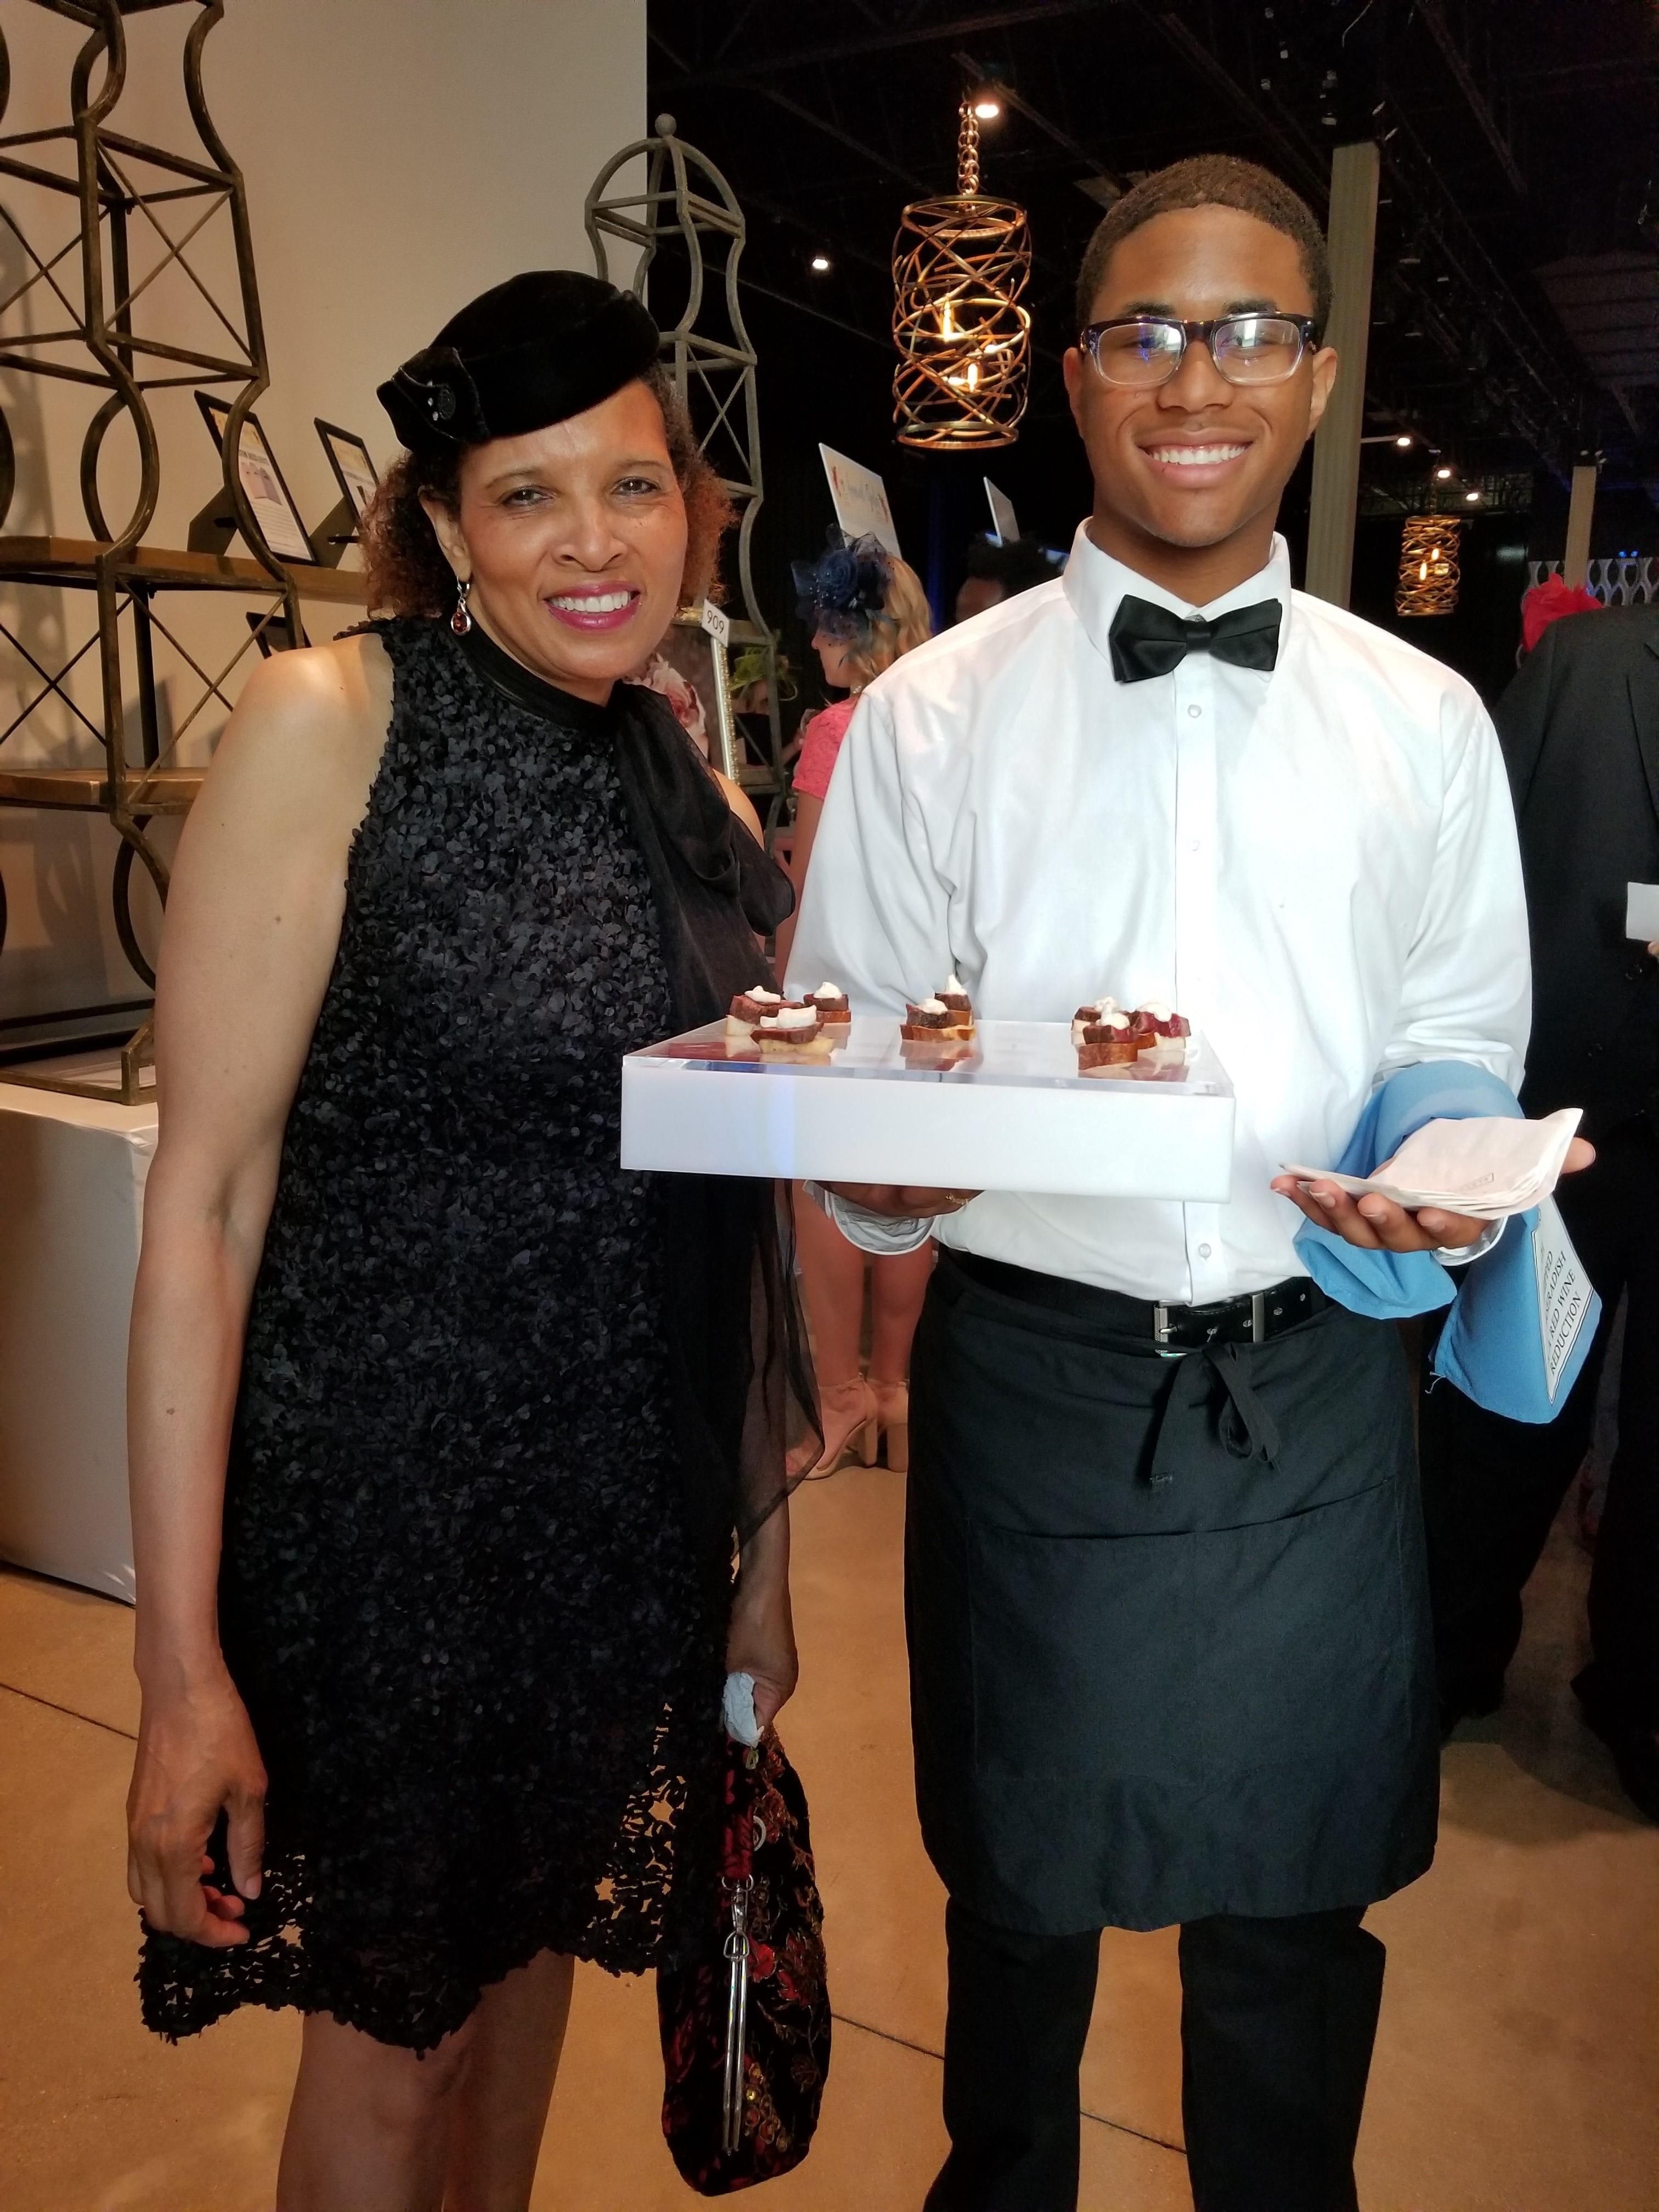 Ronald McDonald House Charities Gala